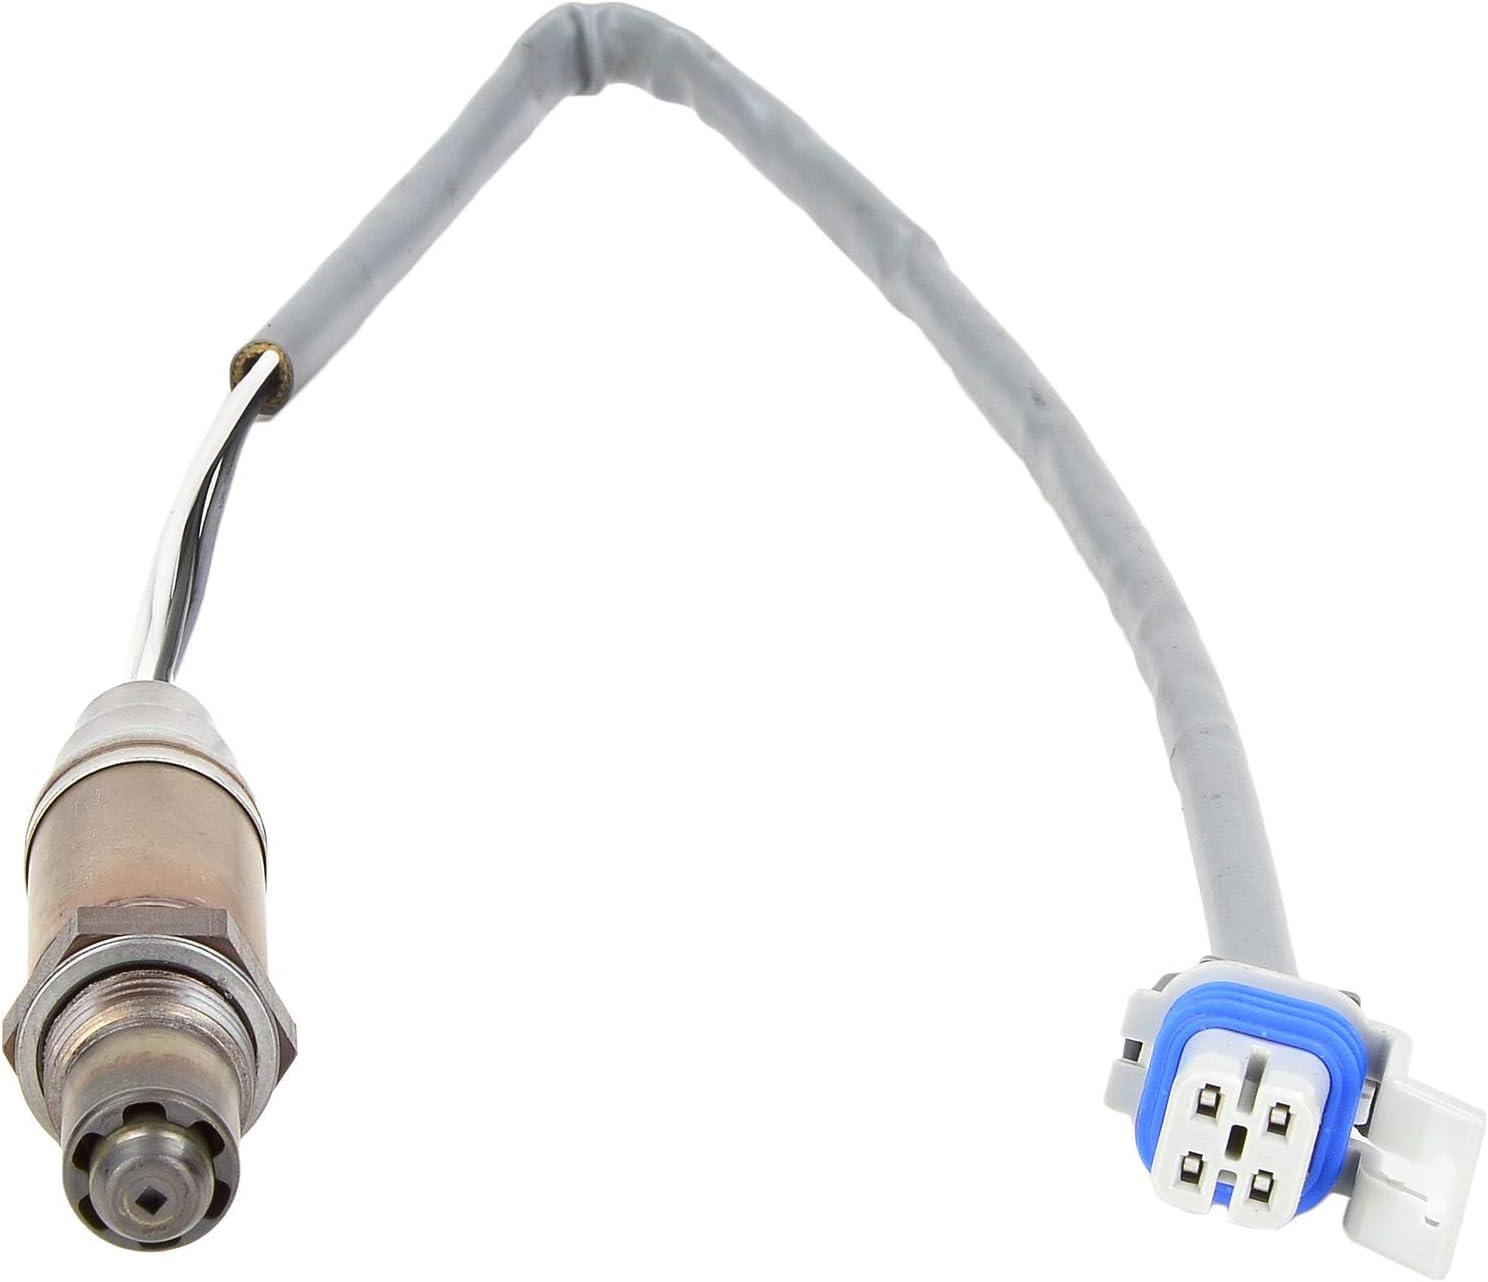 Bosch 15901 Oxygen Sensor, OE Fitment (Chevrolet, GMC, Oldsmobile, Pontiac, Saturn)